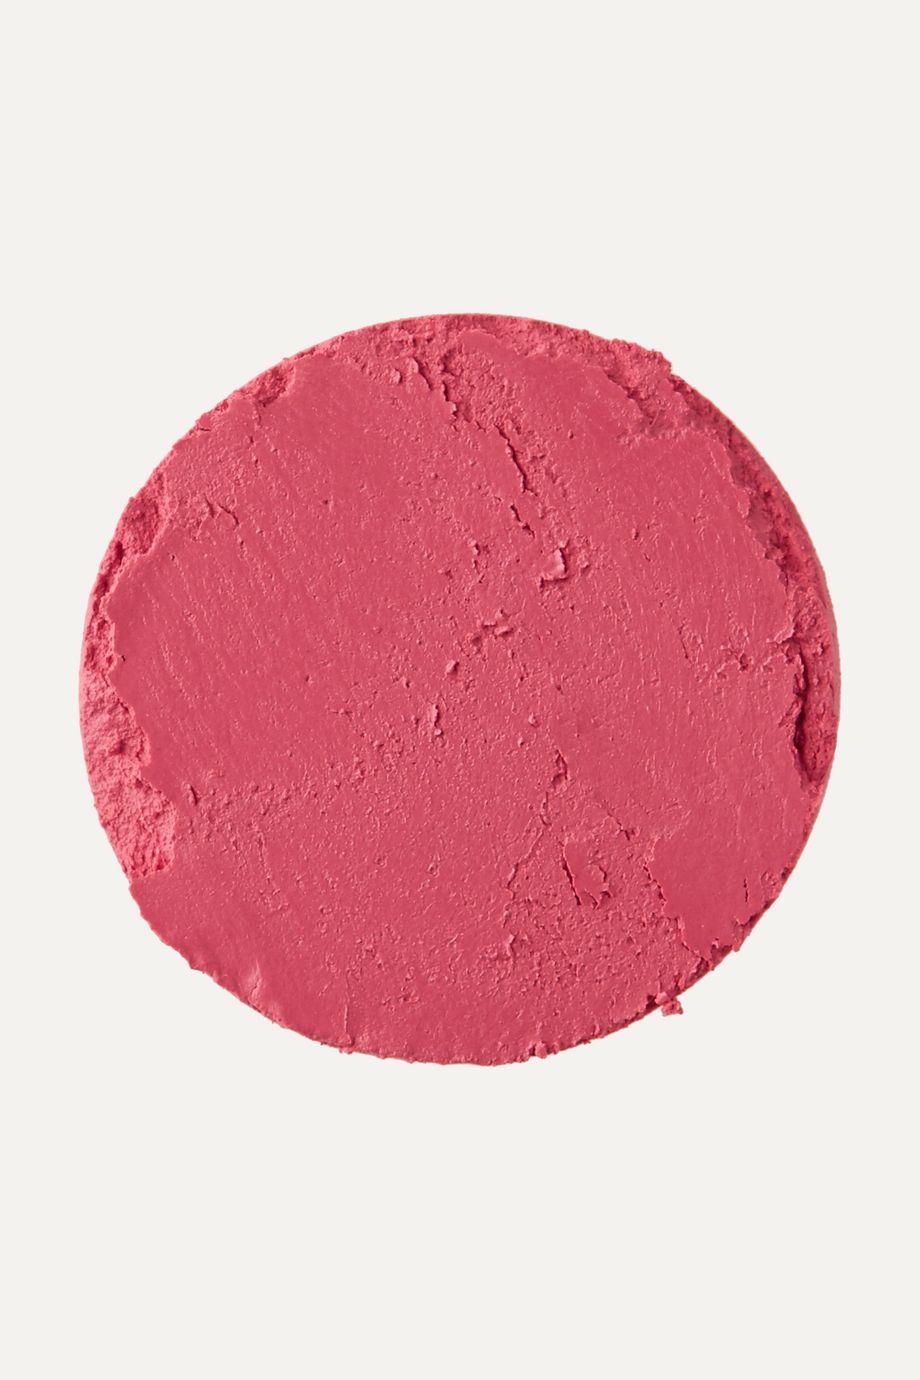 Pat McGrath Labs MatteTrance Lipstick - Polaroid Pink